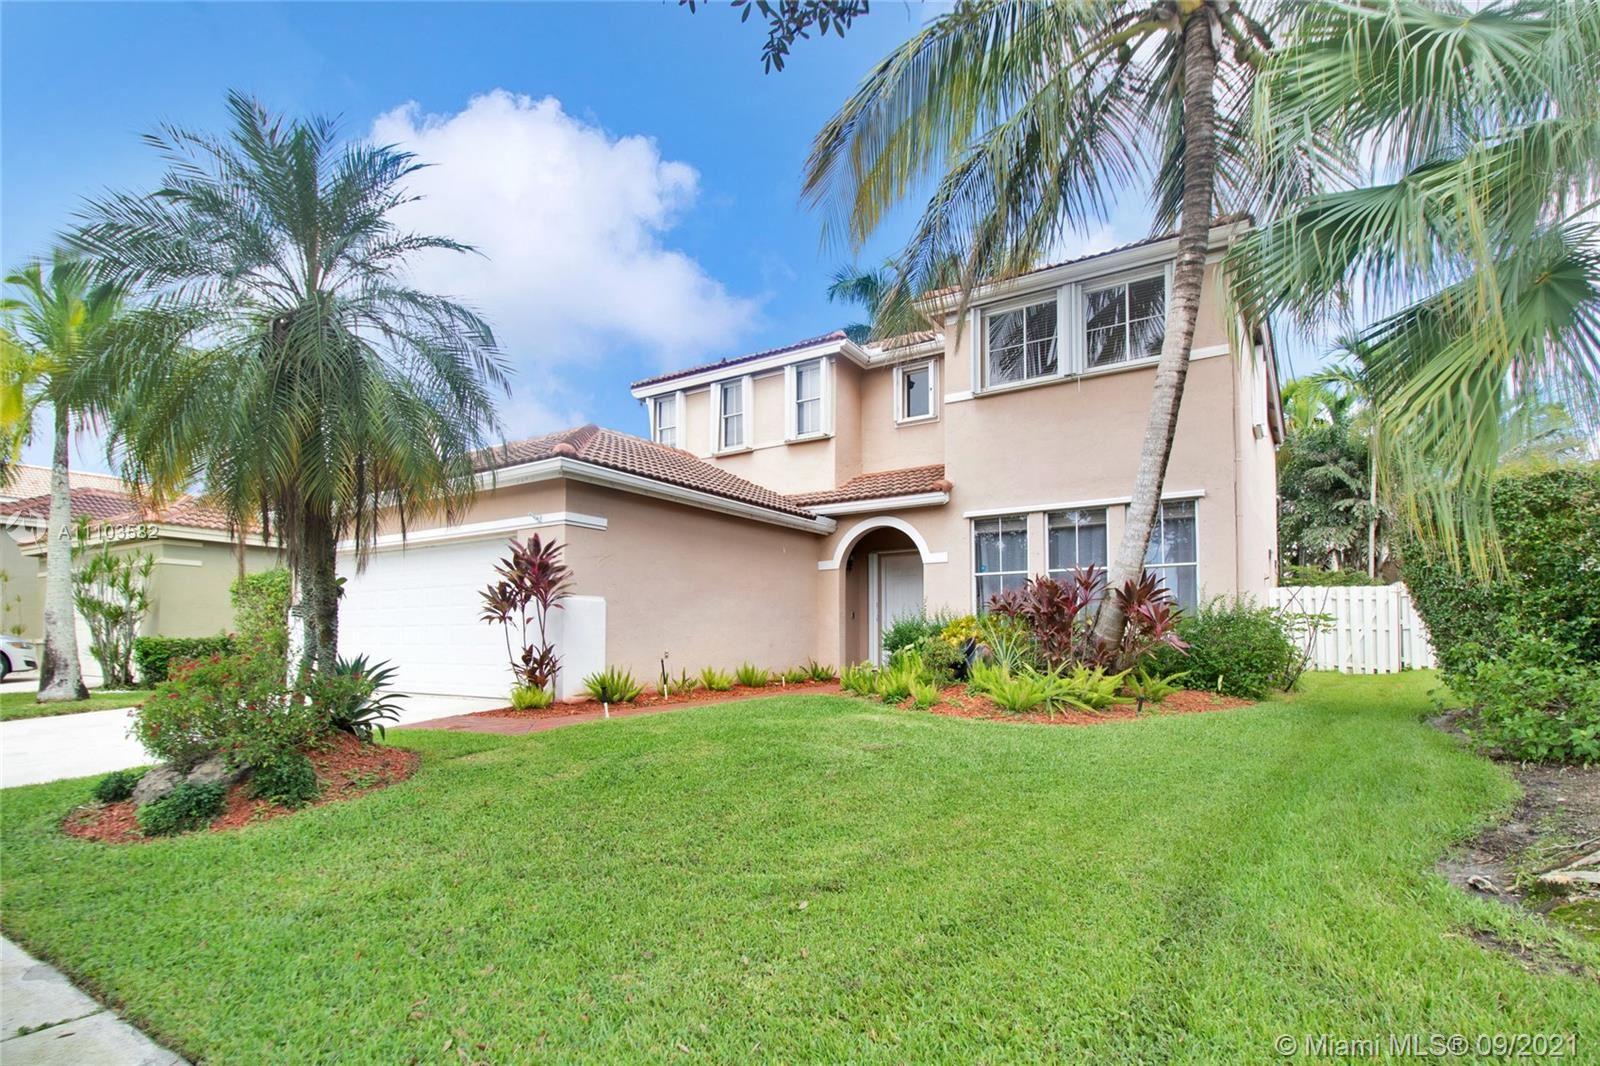 562 Carrington Ln, Weston, FL 33326 - #: A11103582